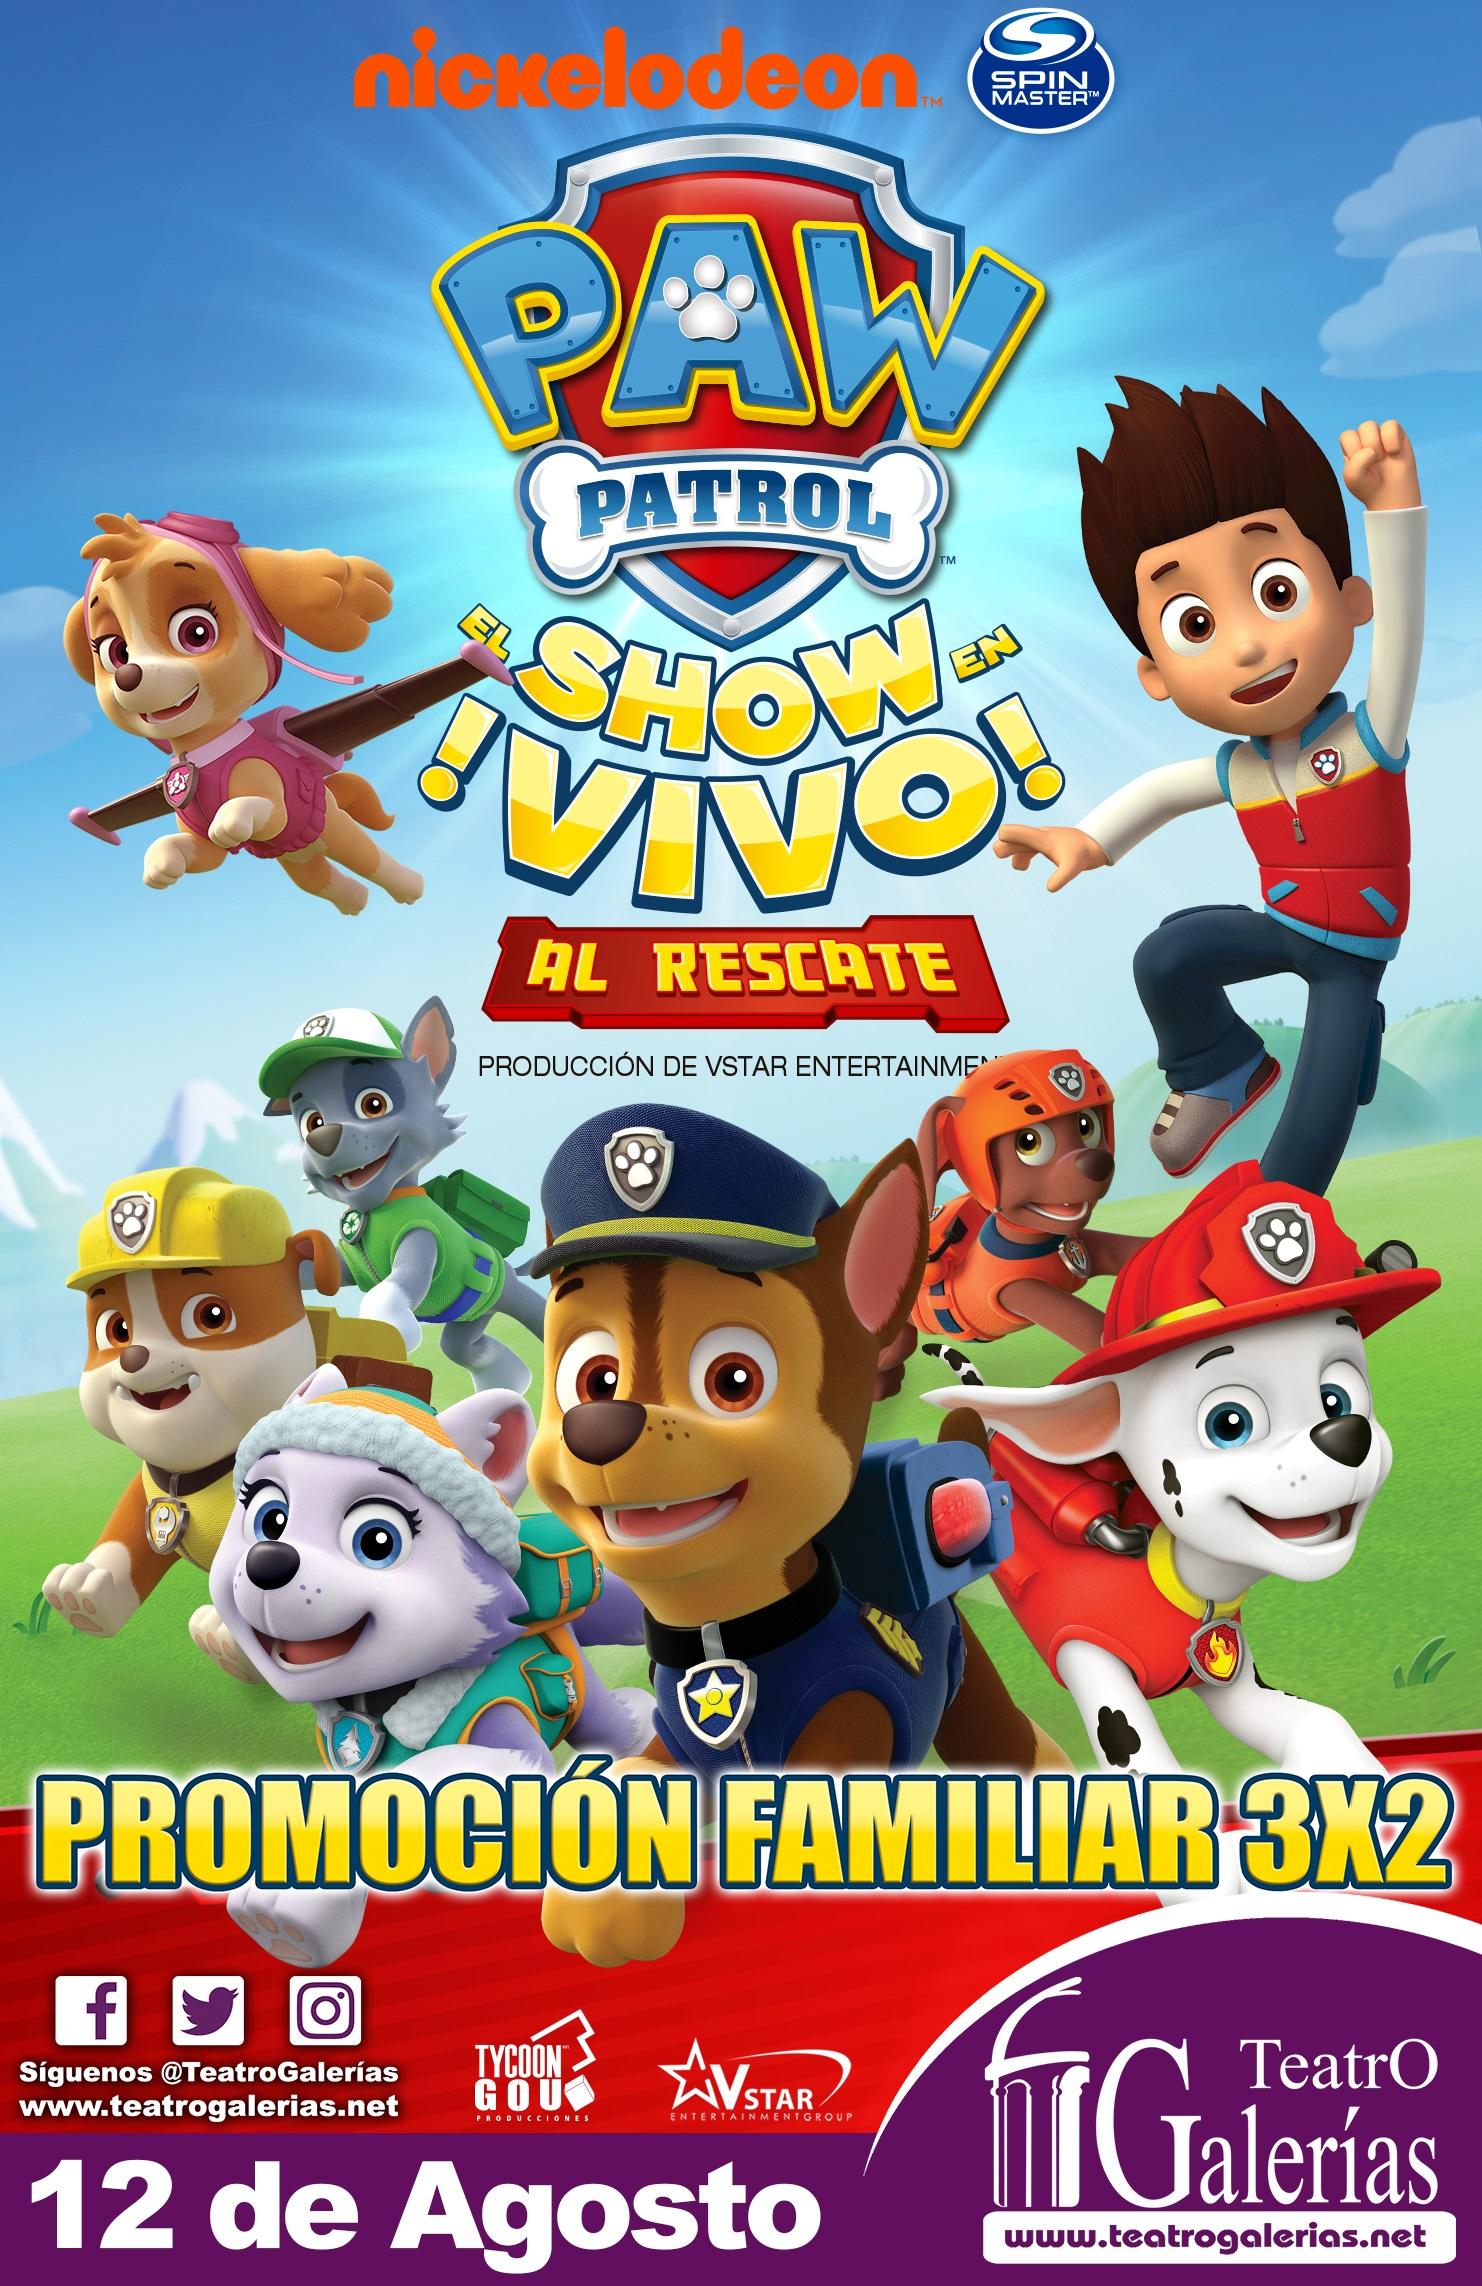 Paw Patrol / Teatro Galerías